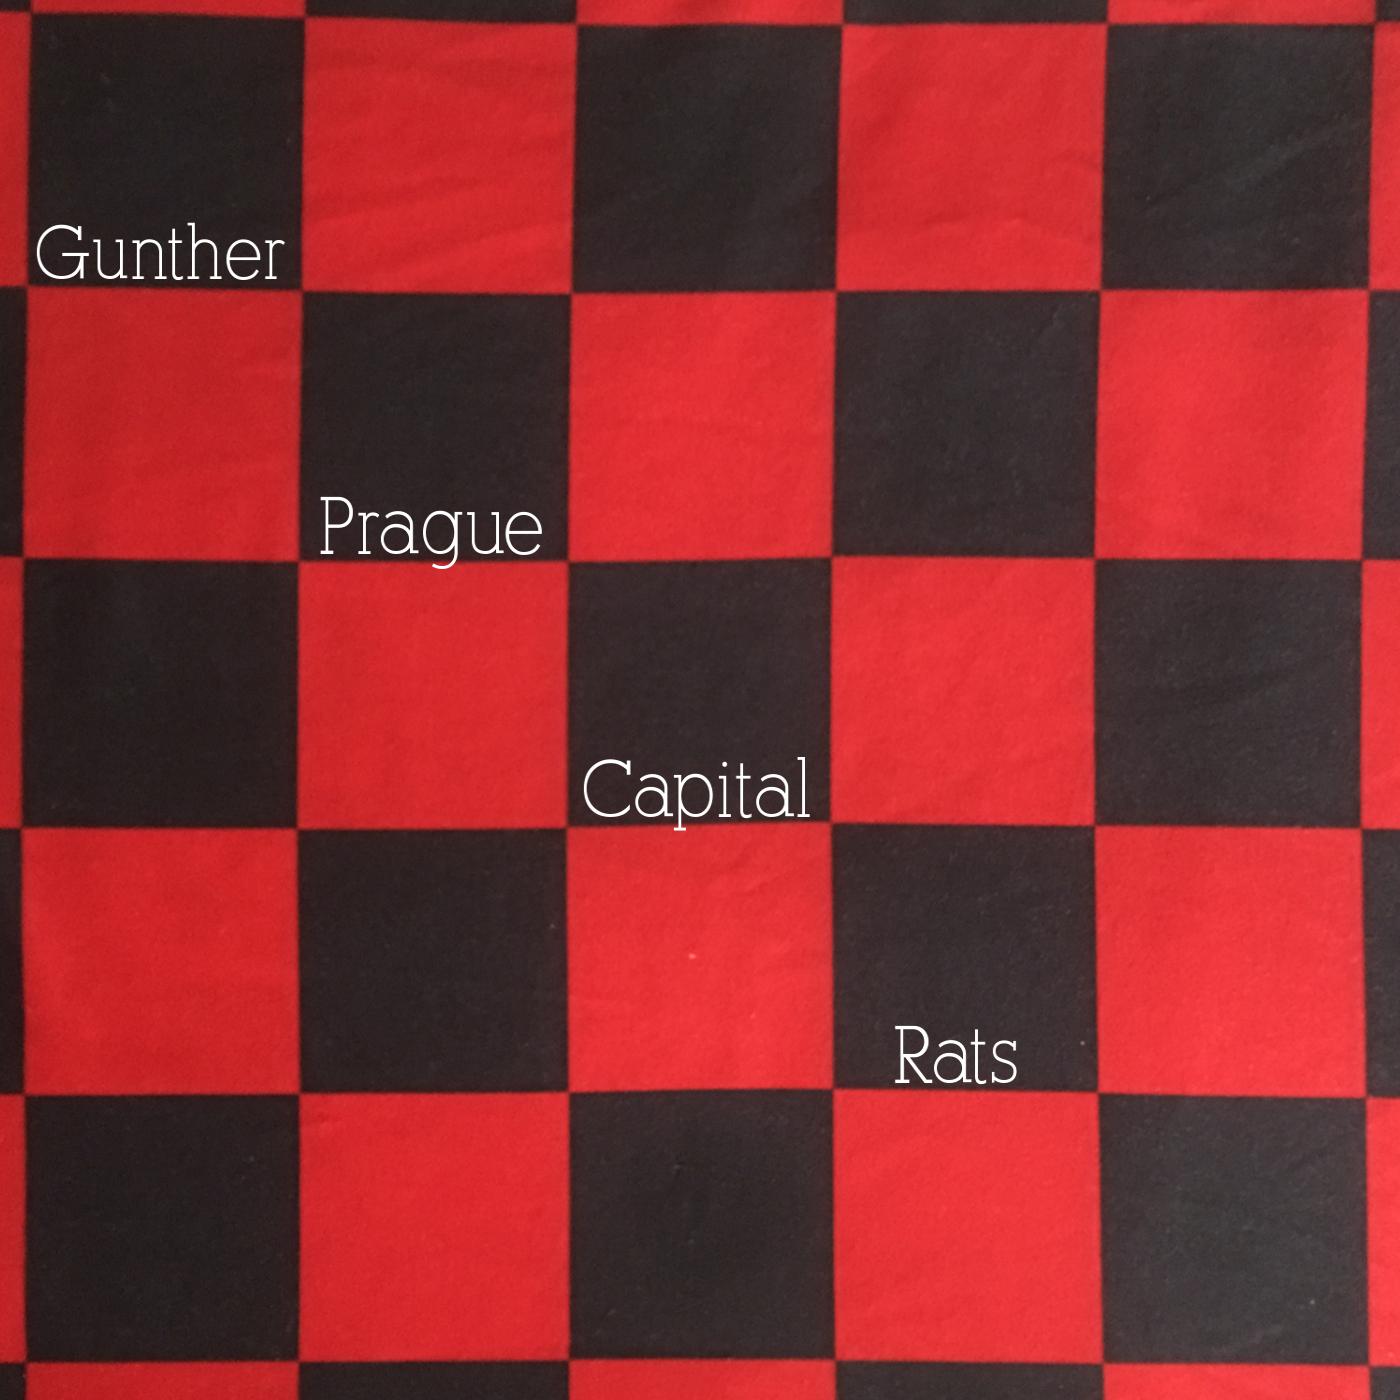 GP Cap Rats sleeve 1400x1400.jpg